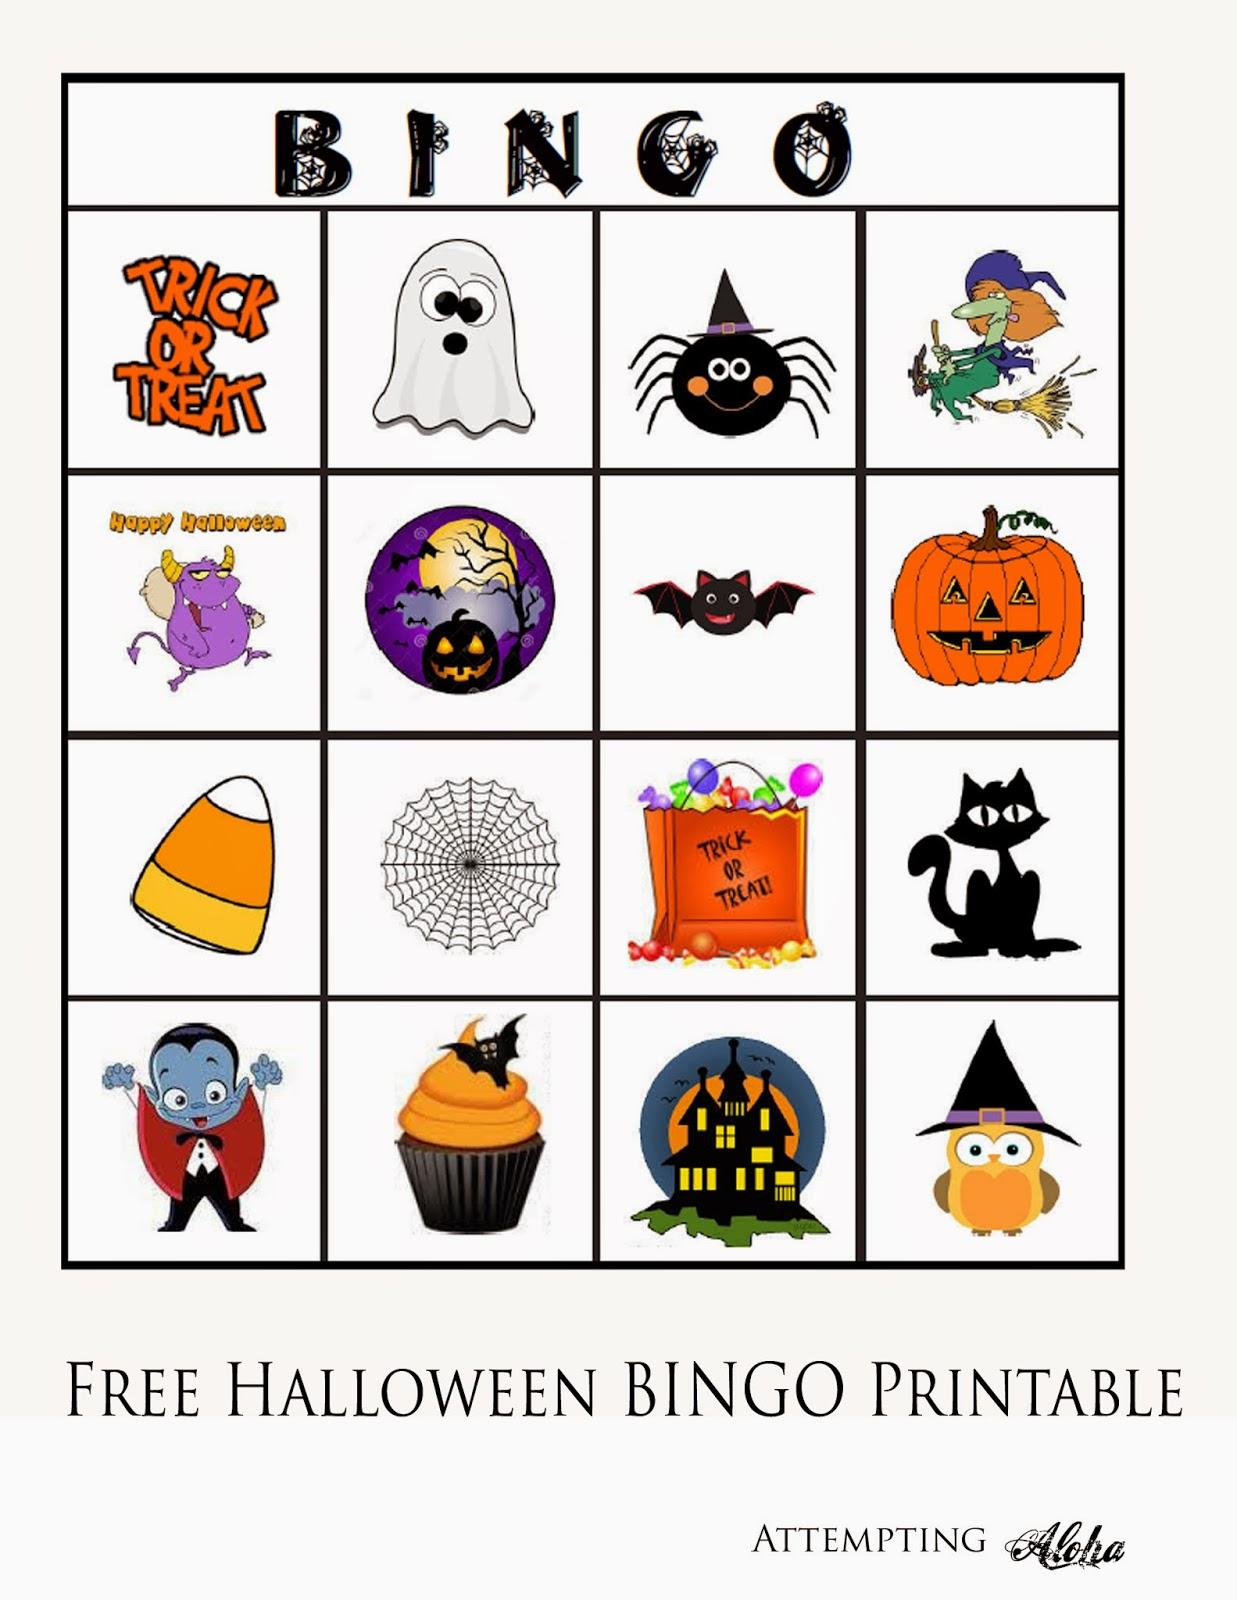 Free Halloween Bingo Printable For Little Kids